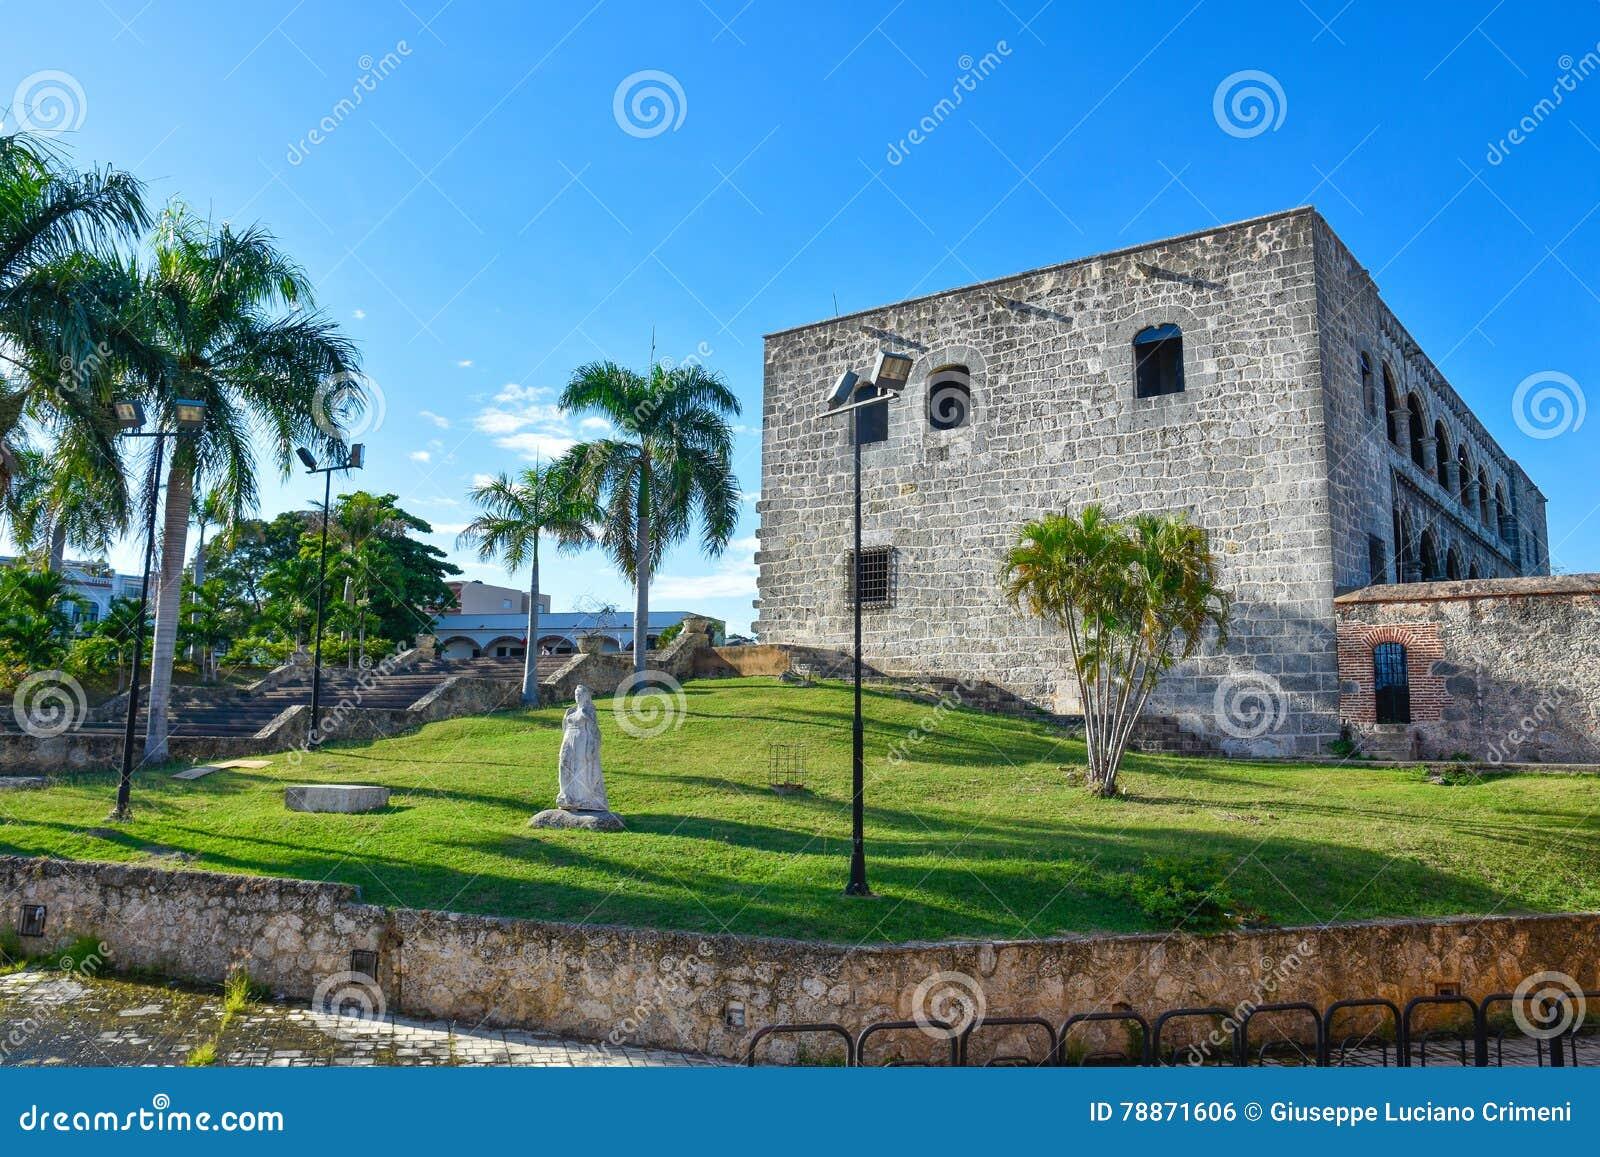 Santo Domingo, Dominican Republic. Statue of Maria De Toledo in Alcazar de Colon (Diego Columbus House).